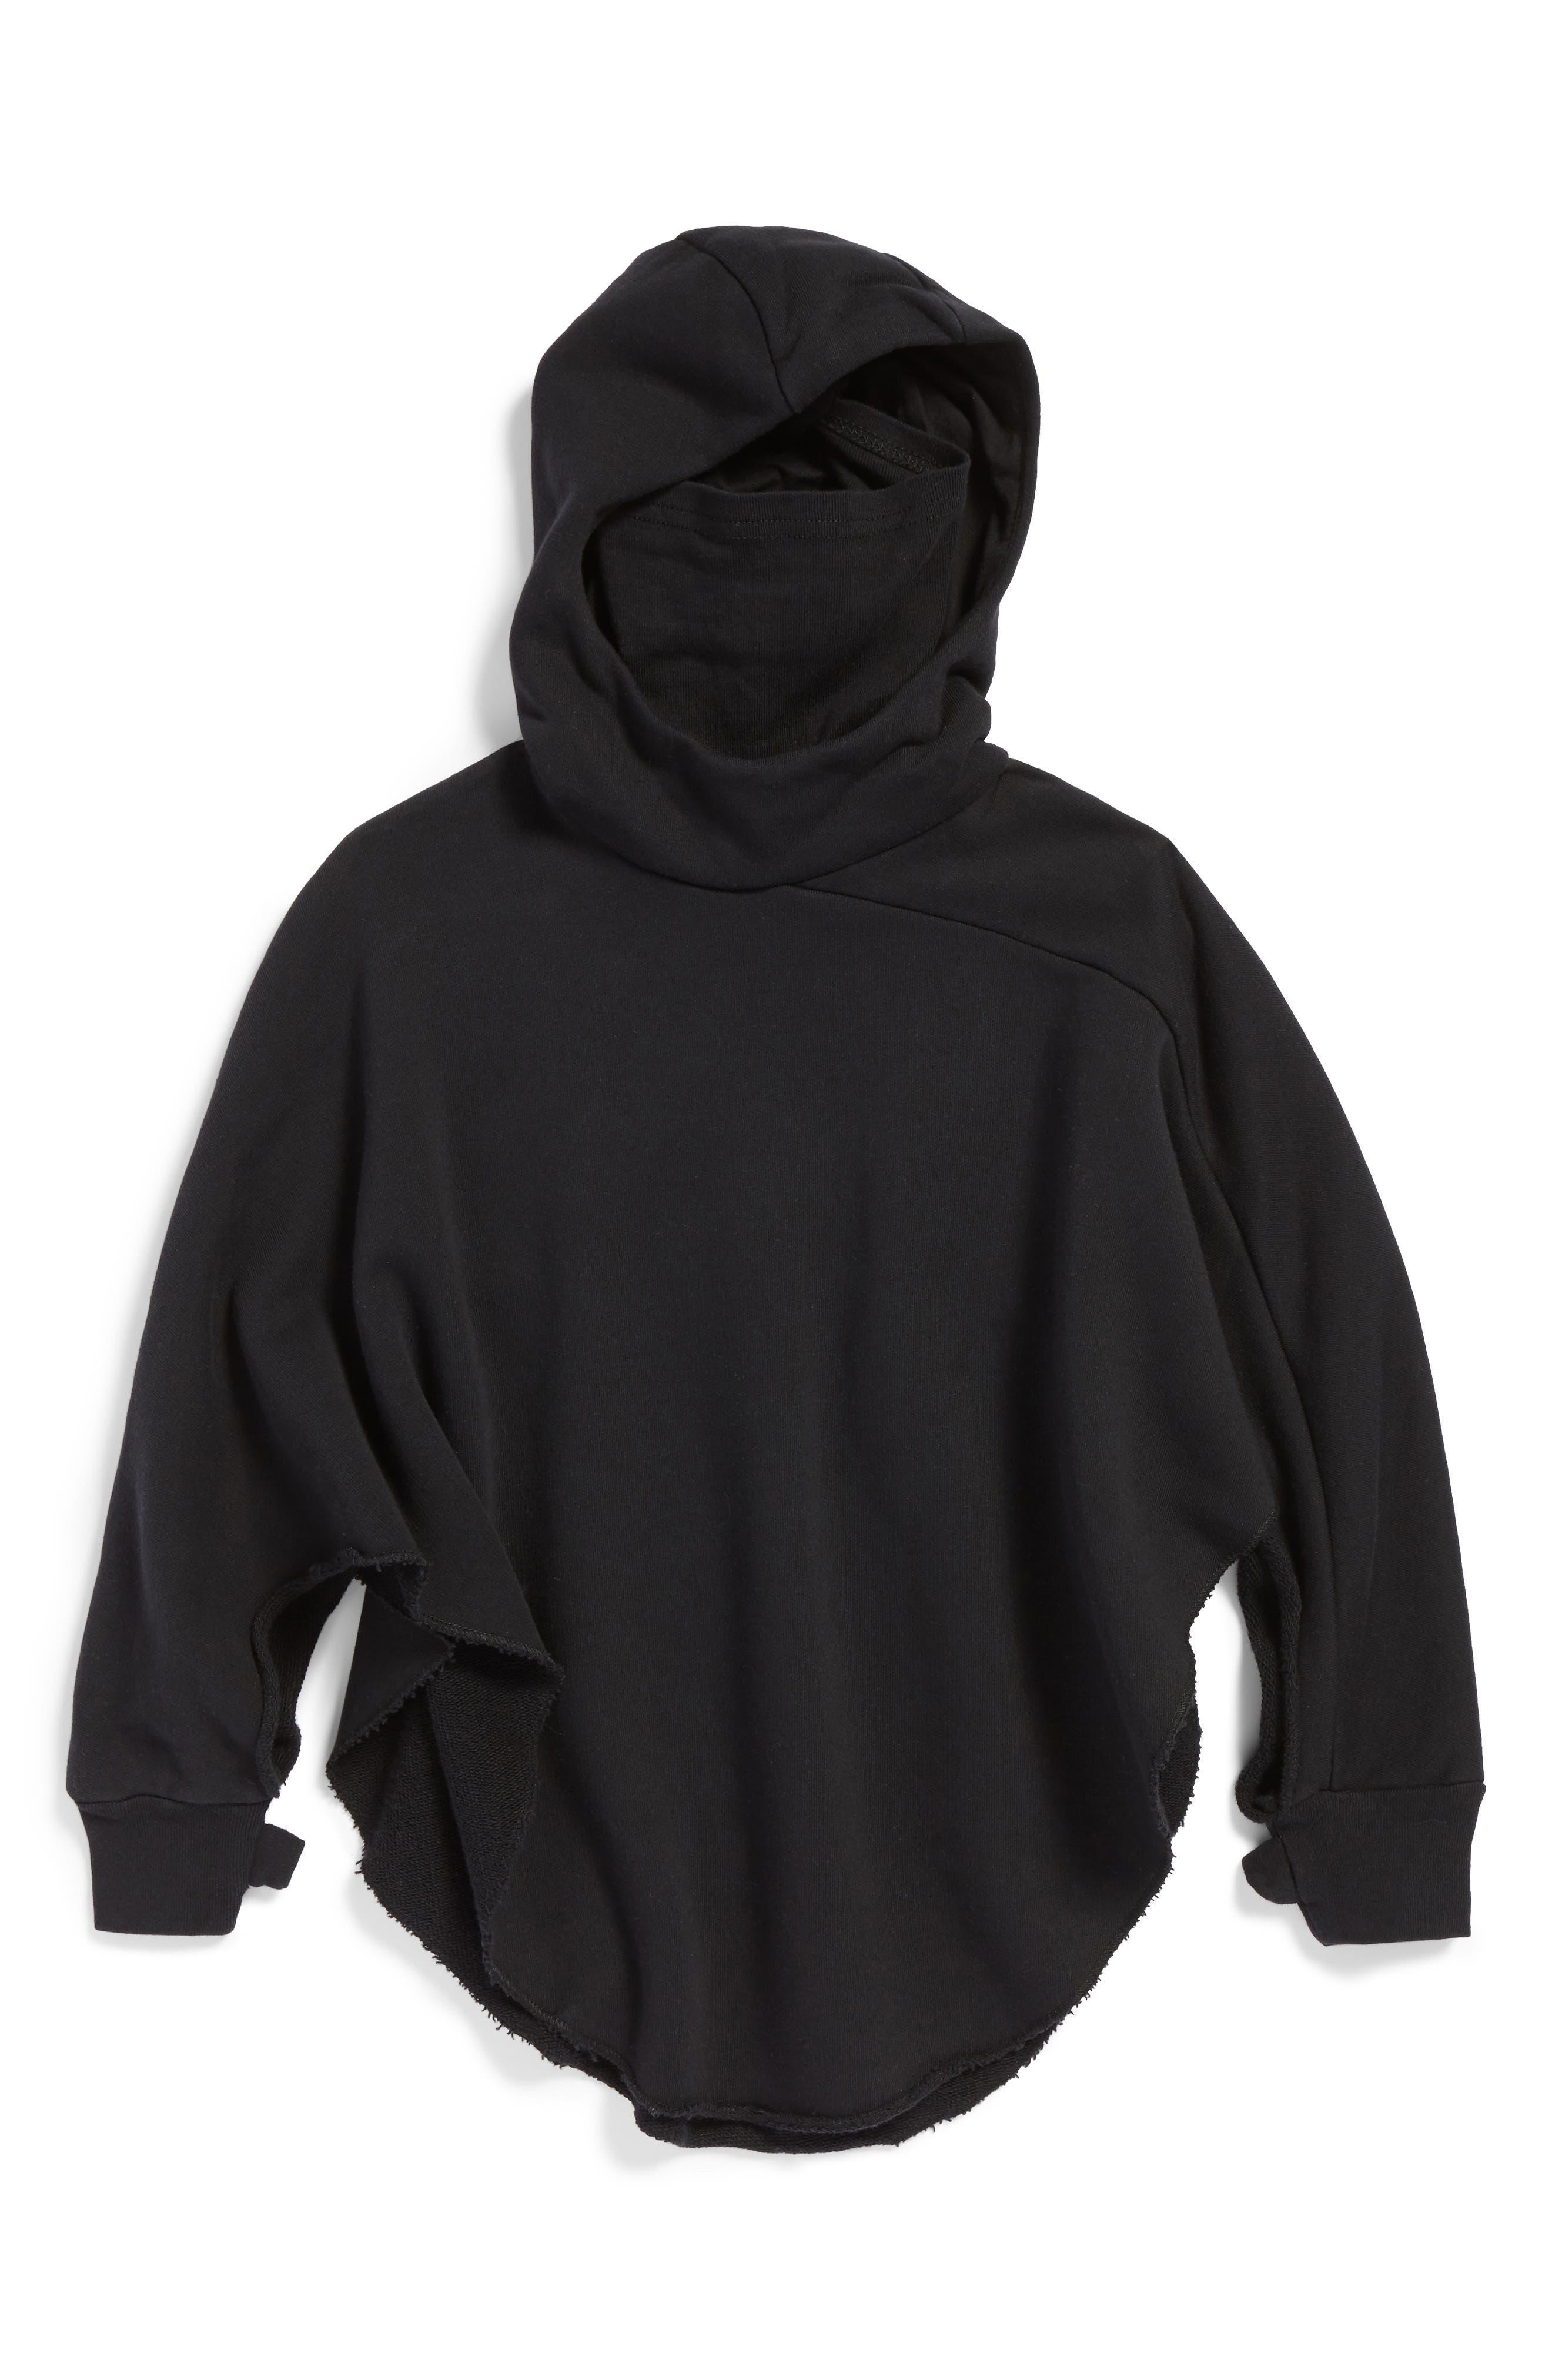 Ninja Hooded Poncho,                             Main thumbnail 1, color,                             001